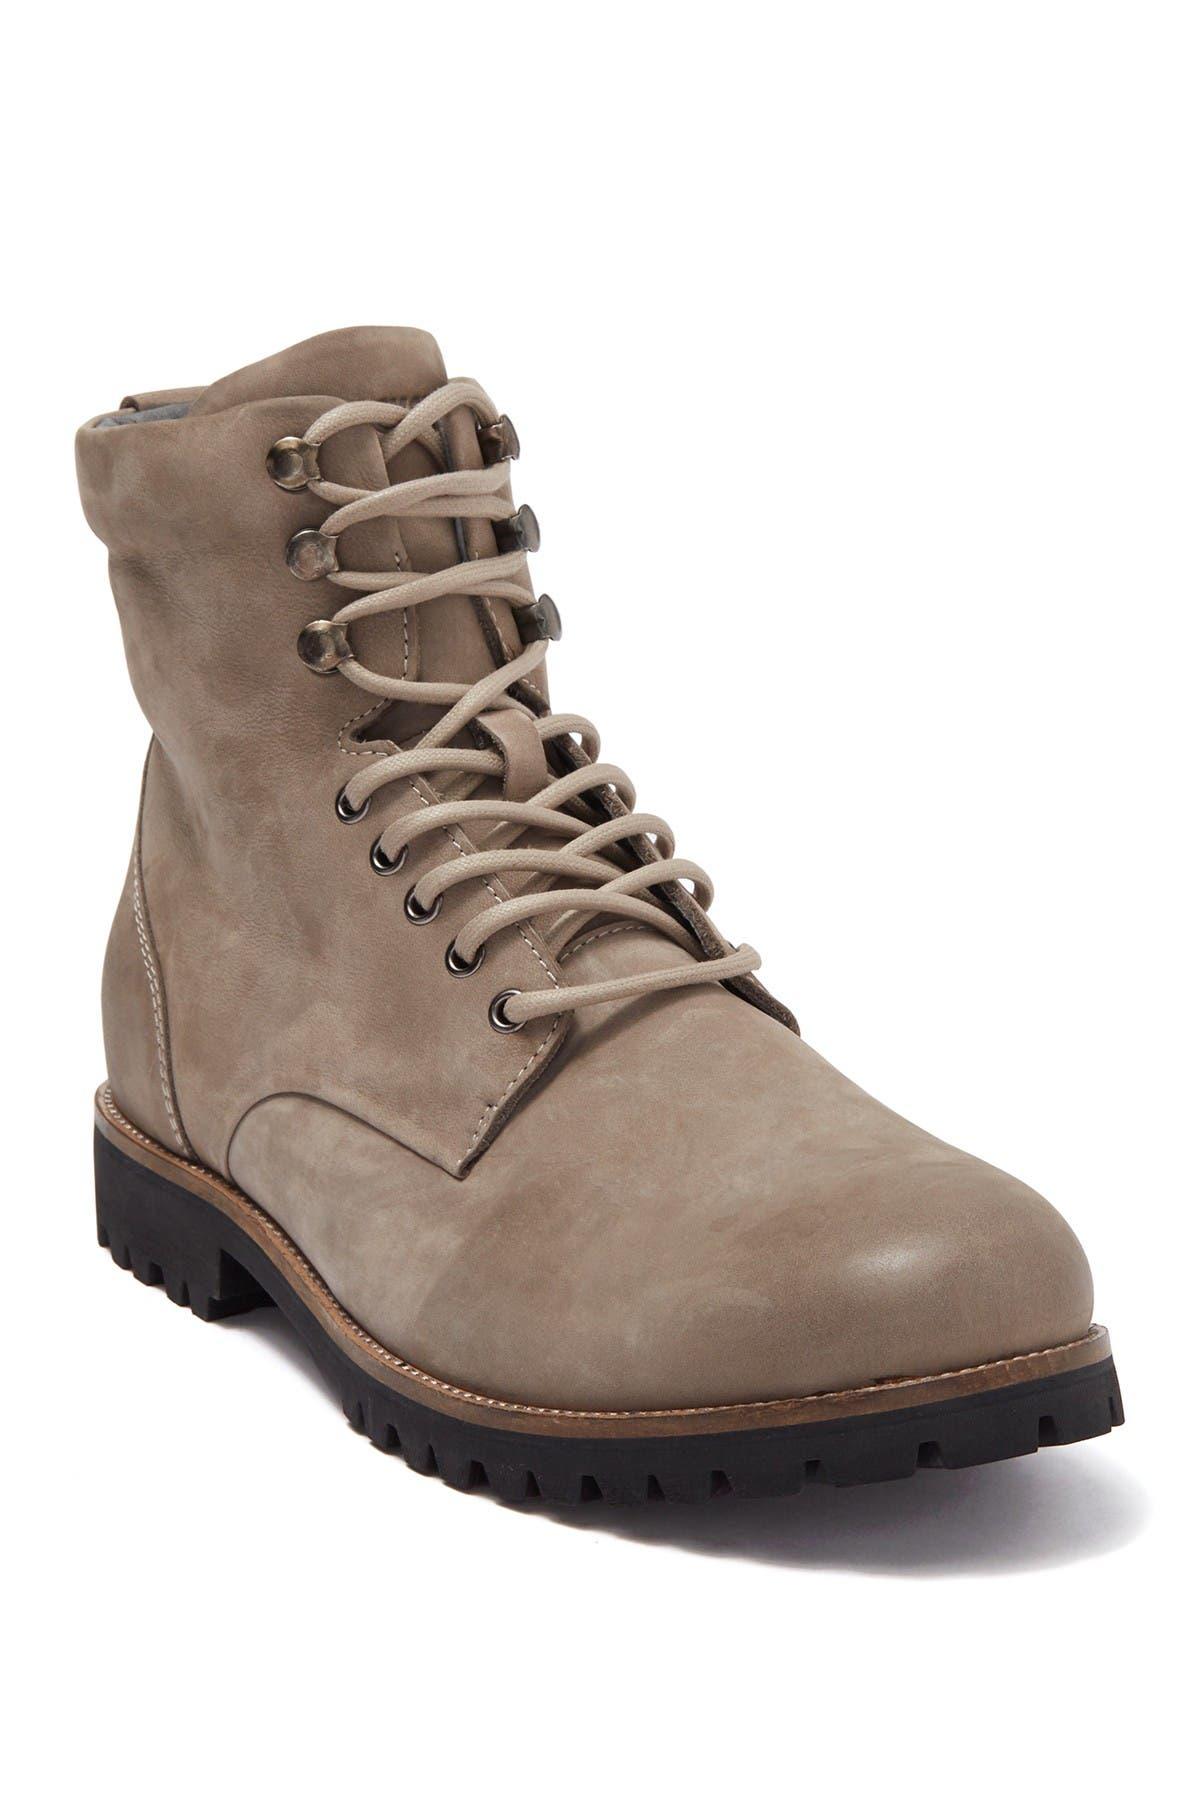 Nubuck Leather Hiker Combat Boot